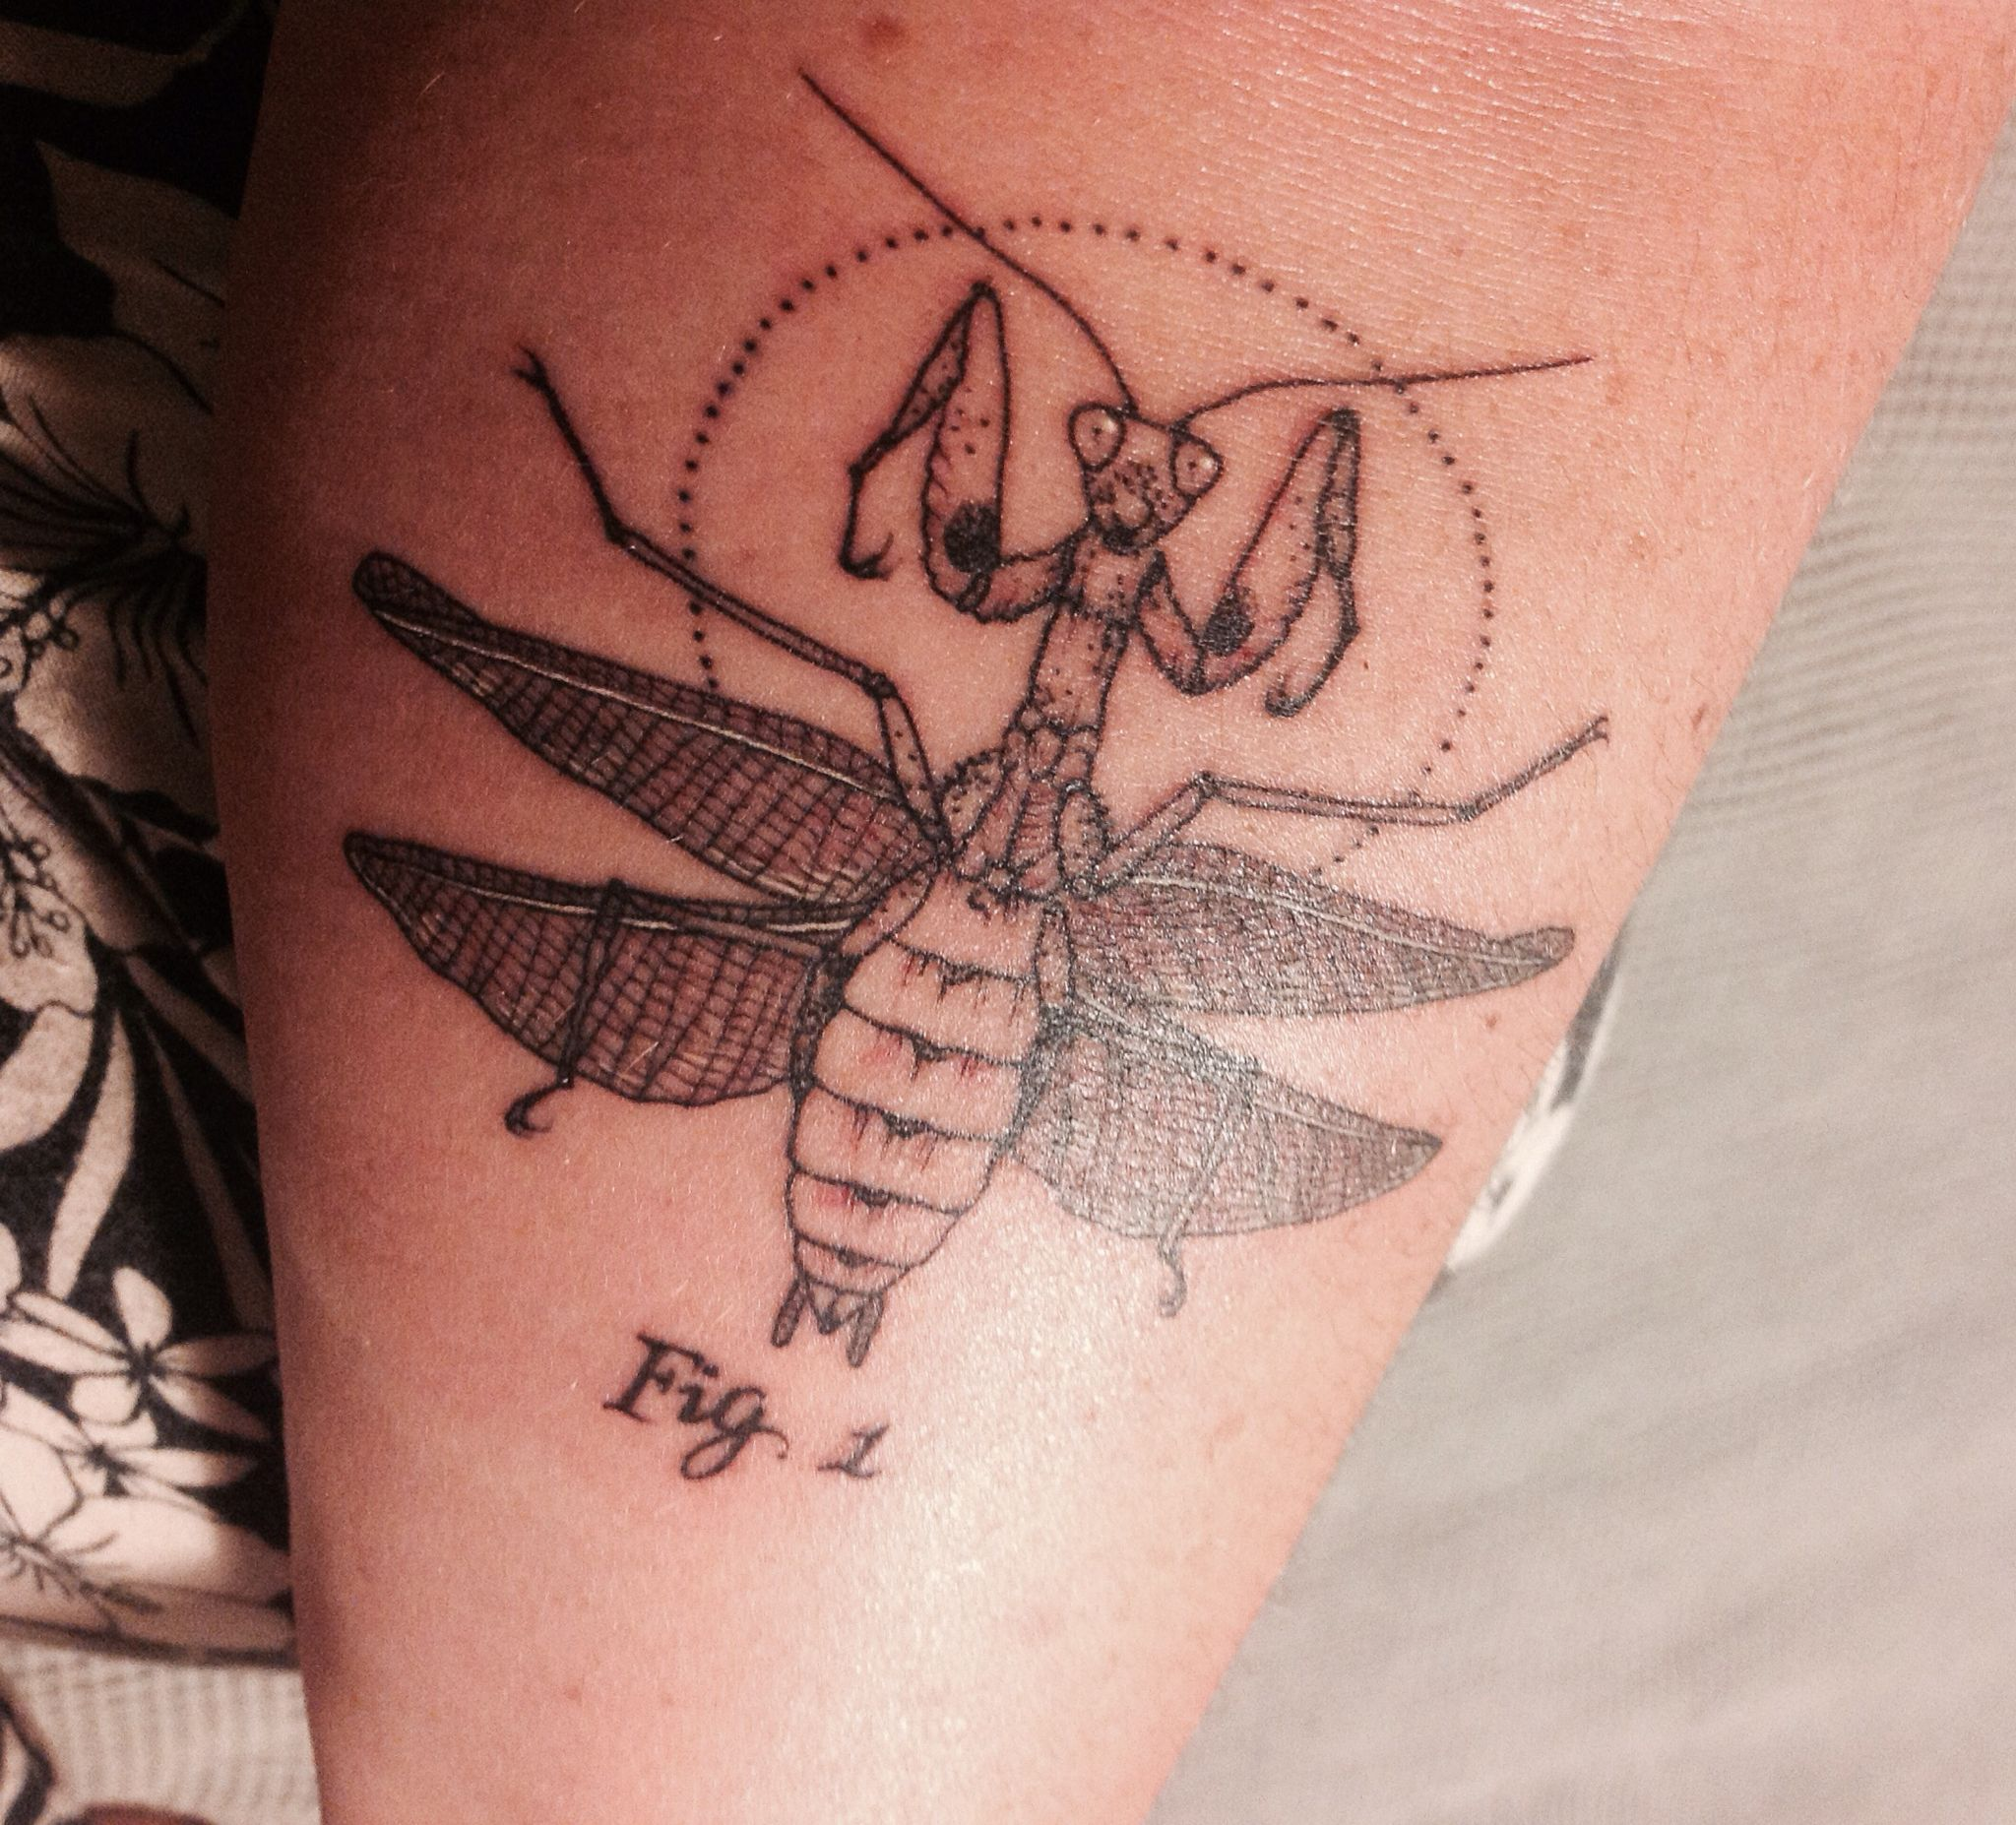 Scientific Illustration Praying Mantis Tattoo By Jasper At Seventh Day Studio New Zealand Mantis Tattoo Tattoos Insect Tattoo